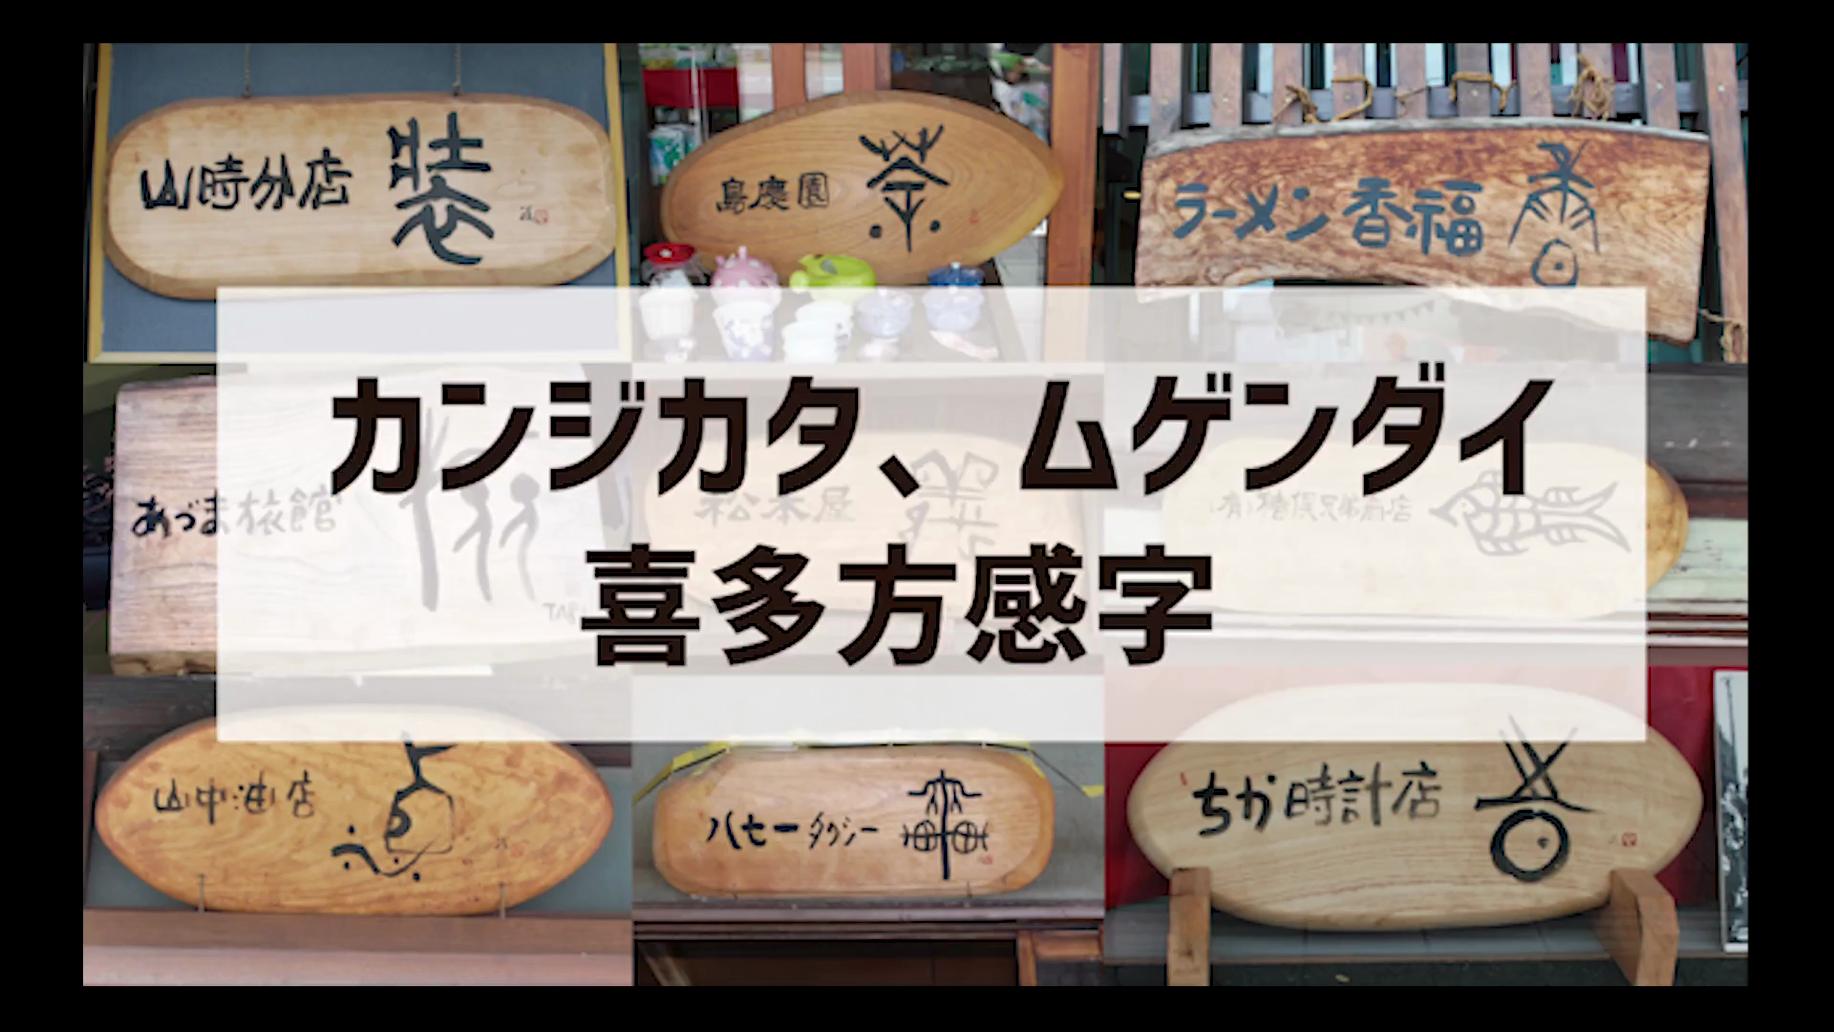 My Japan Award 投稿作品 『「感字」の街、喜多方。』.mp4[2017-11-28 20-02-58.449].jpg